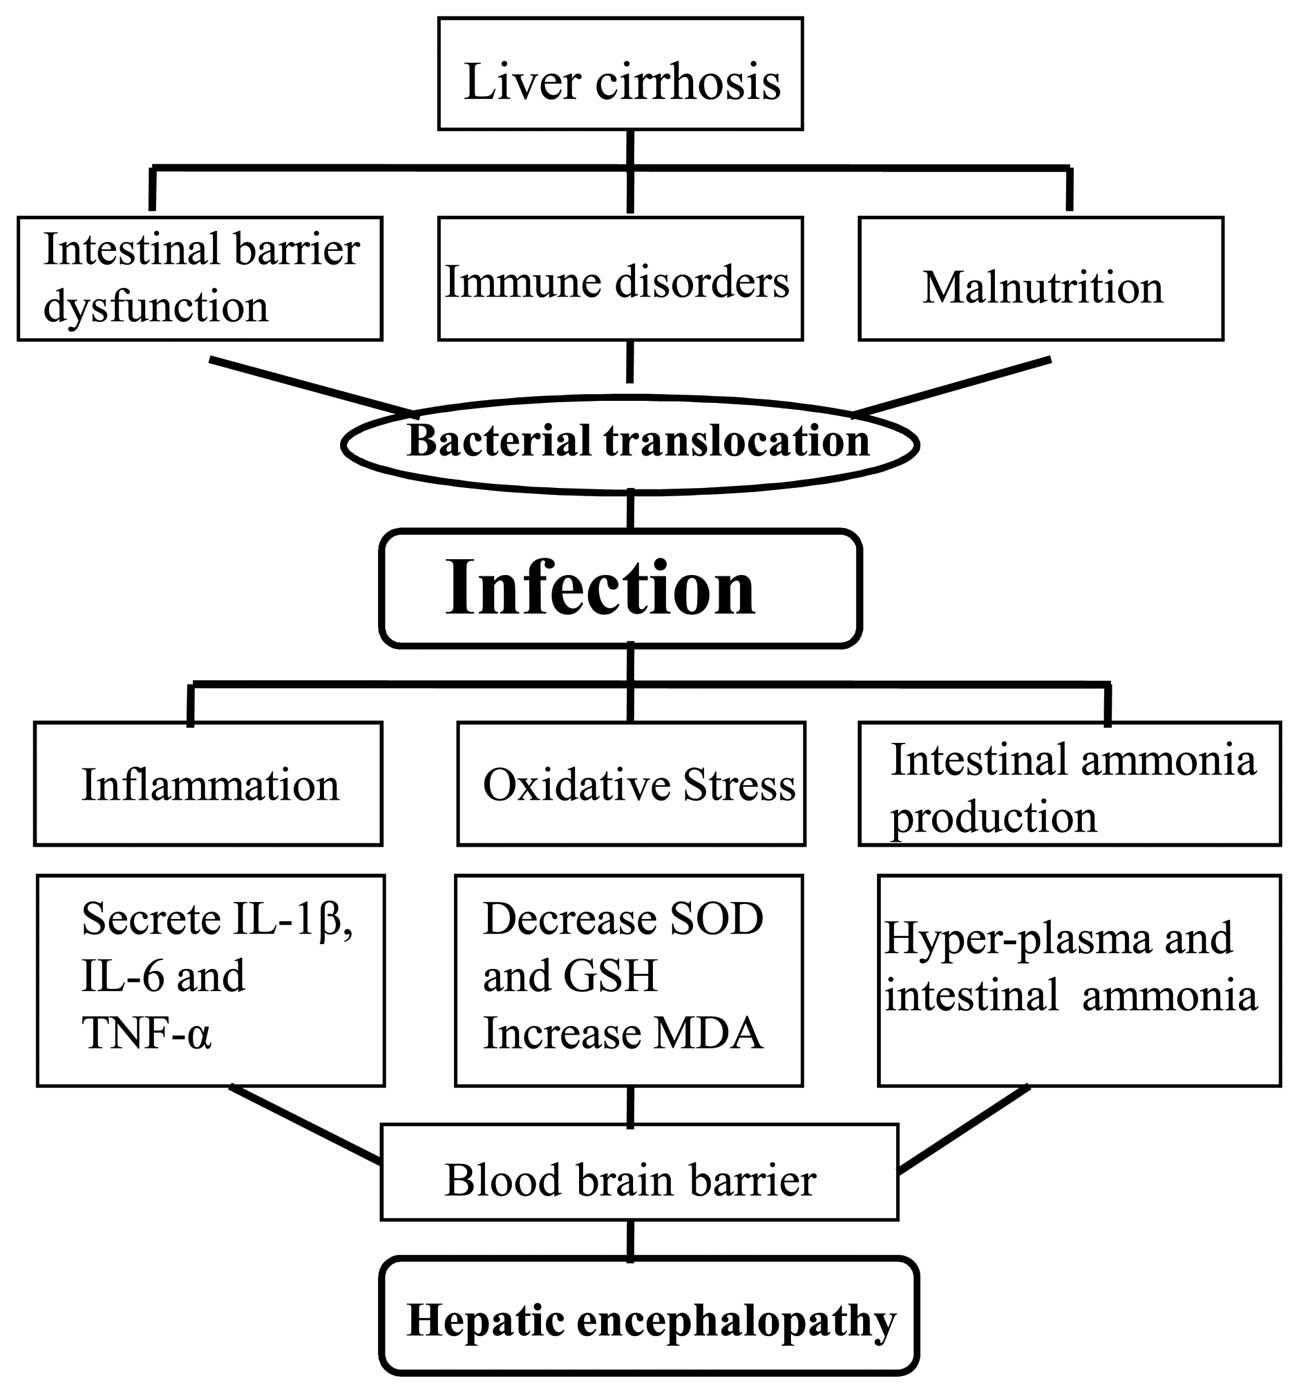 liver cancer hepatic encephalopathy enterobius vermicularis biologia